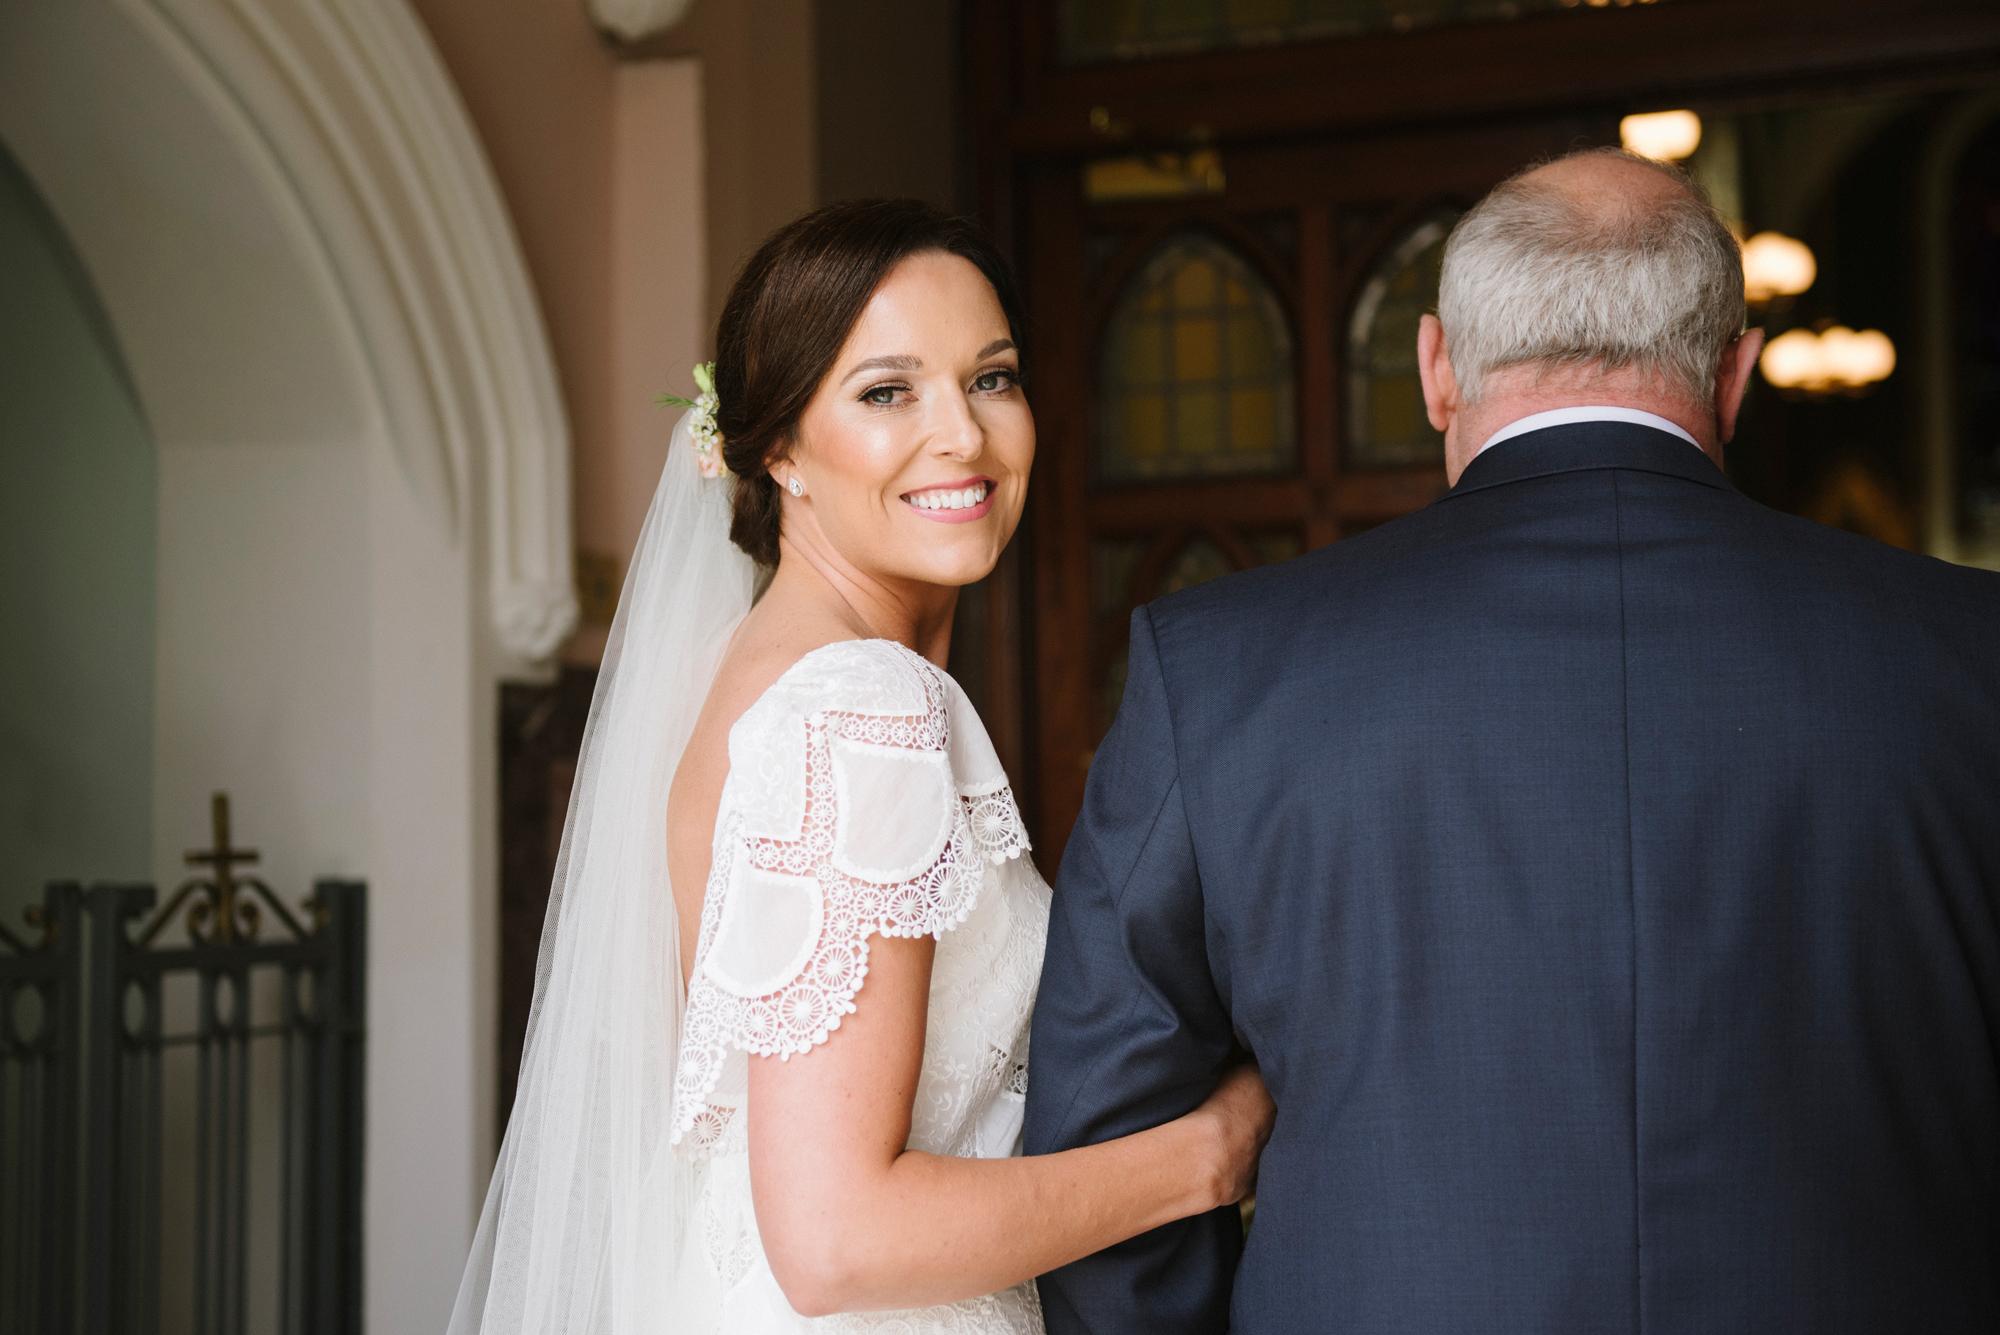 ghan_house_Wedding_Sarah_Fyffe_wedding_photographyer_7.jpg